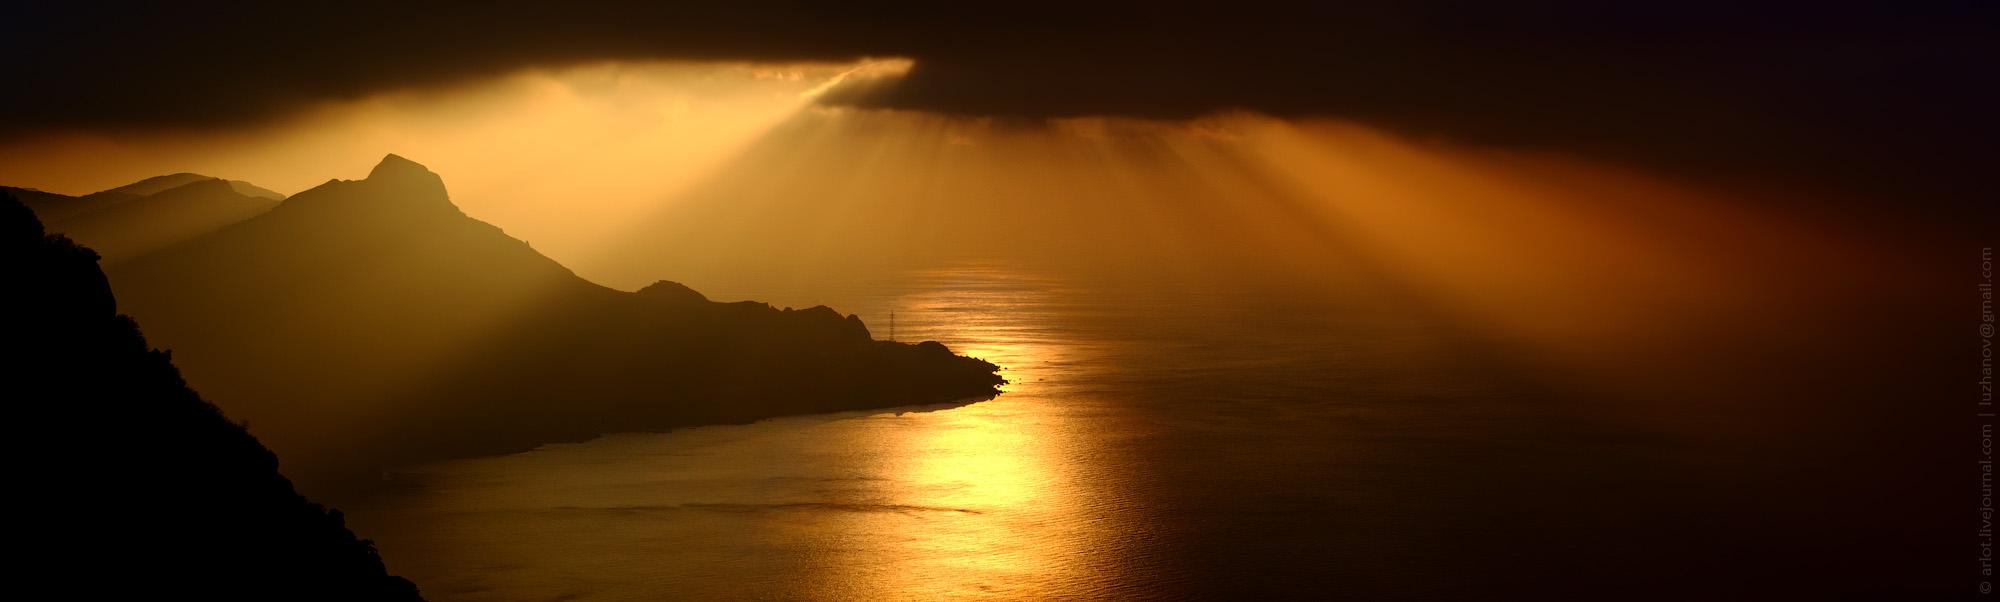 Dawn over the cape Sarych | dawn, cape, Sarych, Crimea, rays, shine , sky  , sea, water, landscape